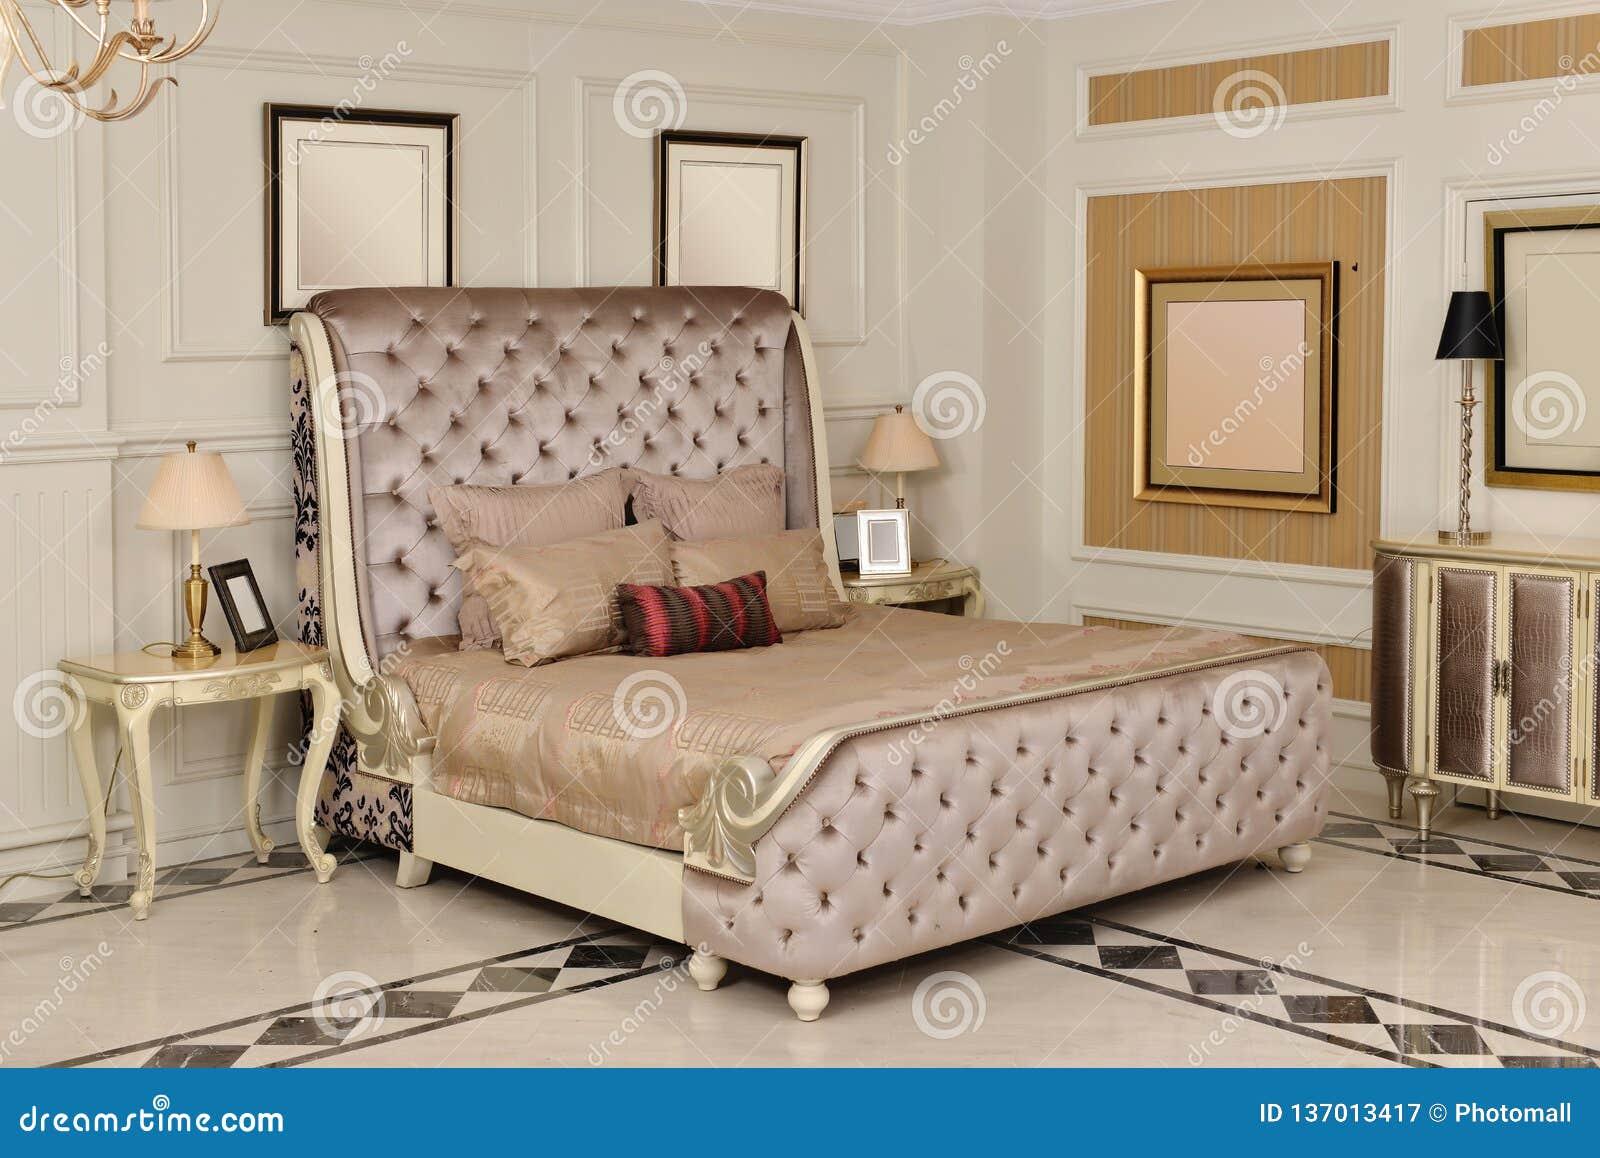 Bedroom Room Furniture In Luxury House Stock Image - Image ...